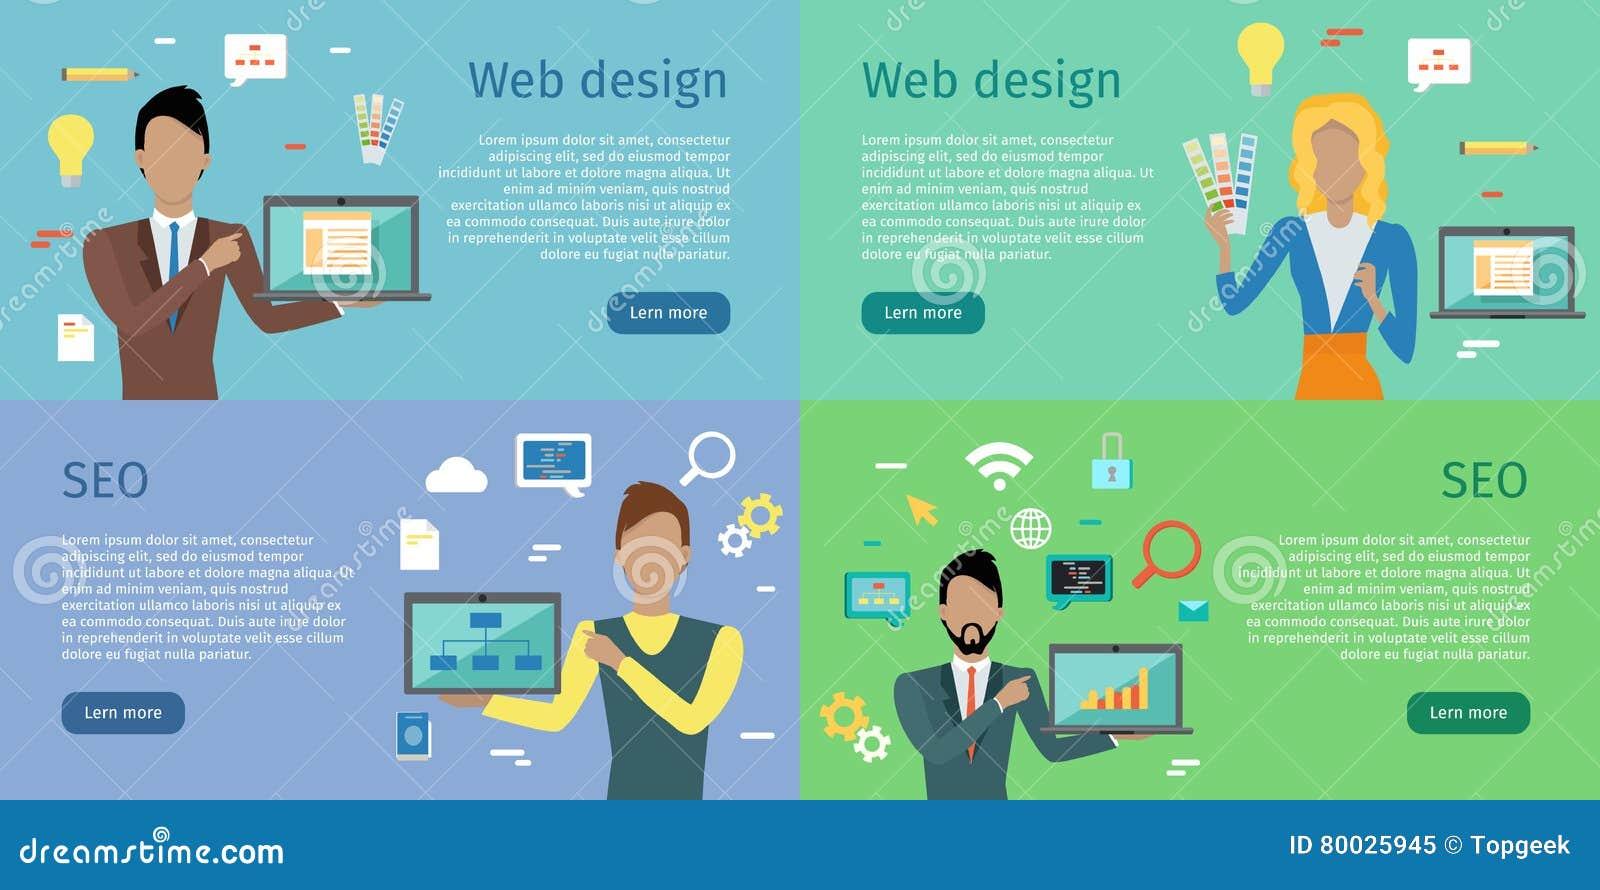 Design web, SEO Infographic Set